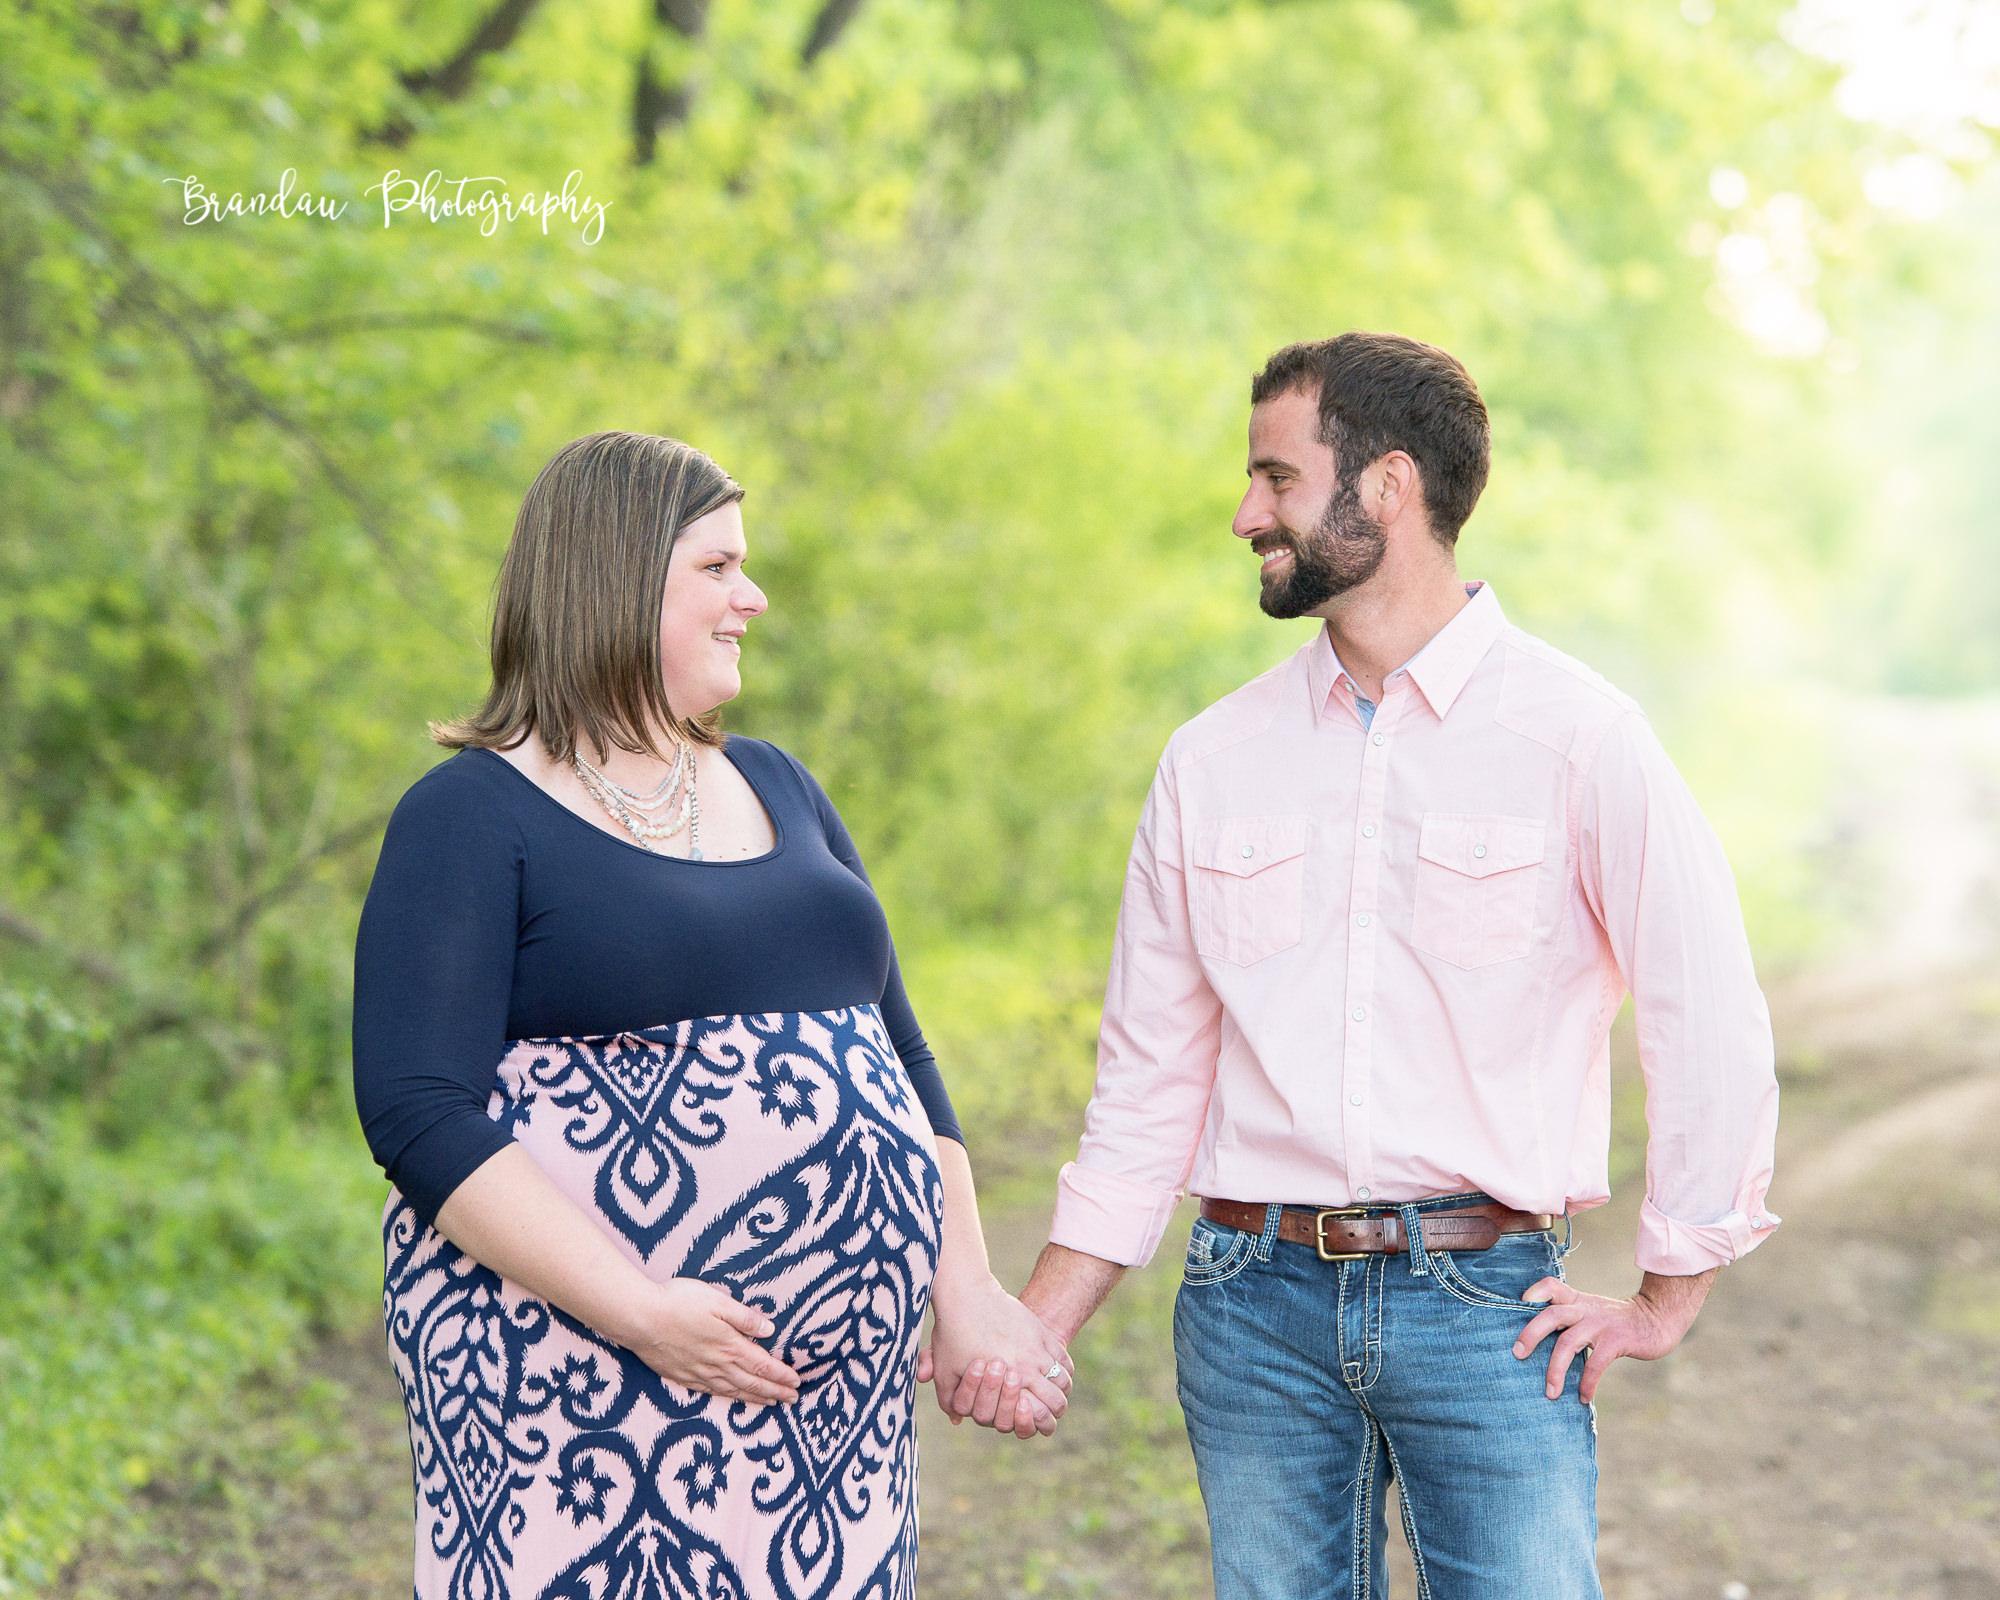 Engagement Holding Hands_Brandau Photography-19.jpg